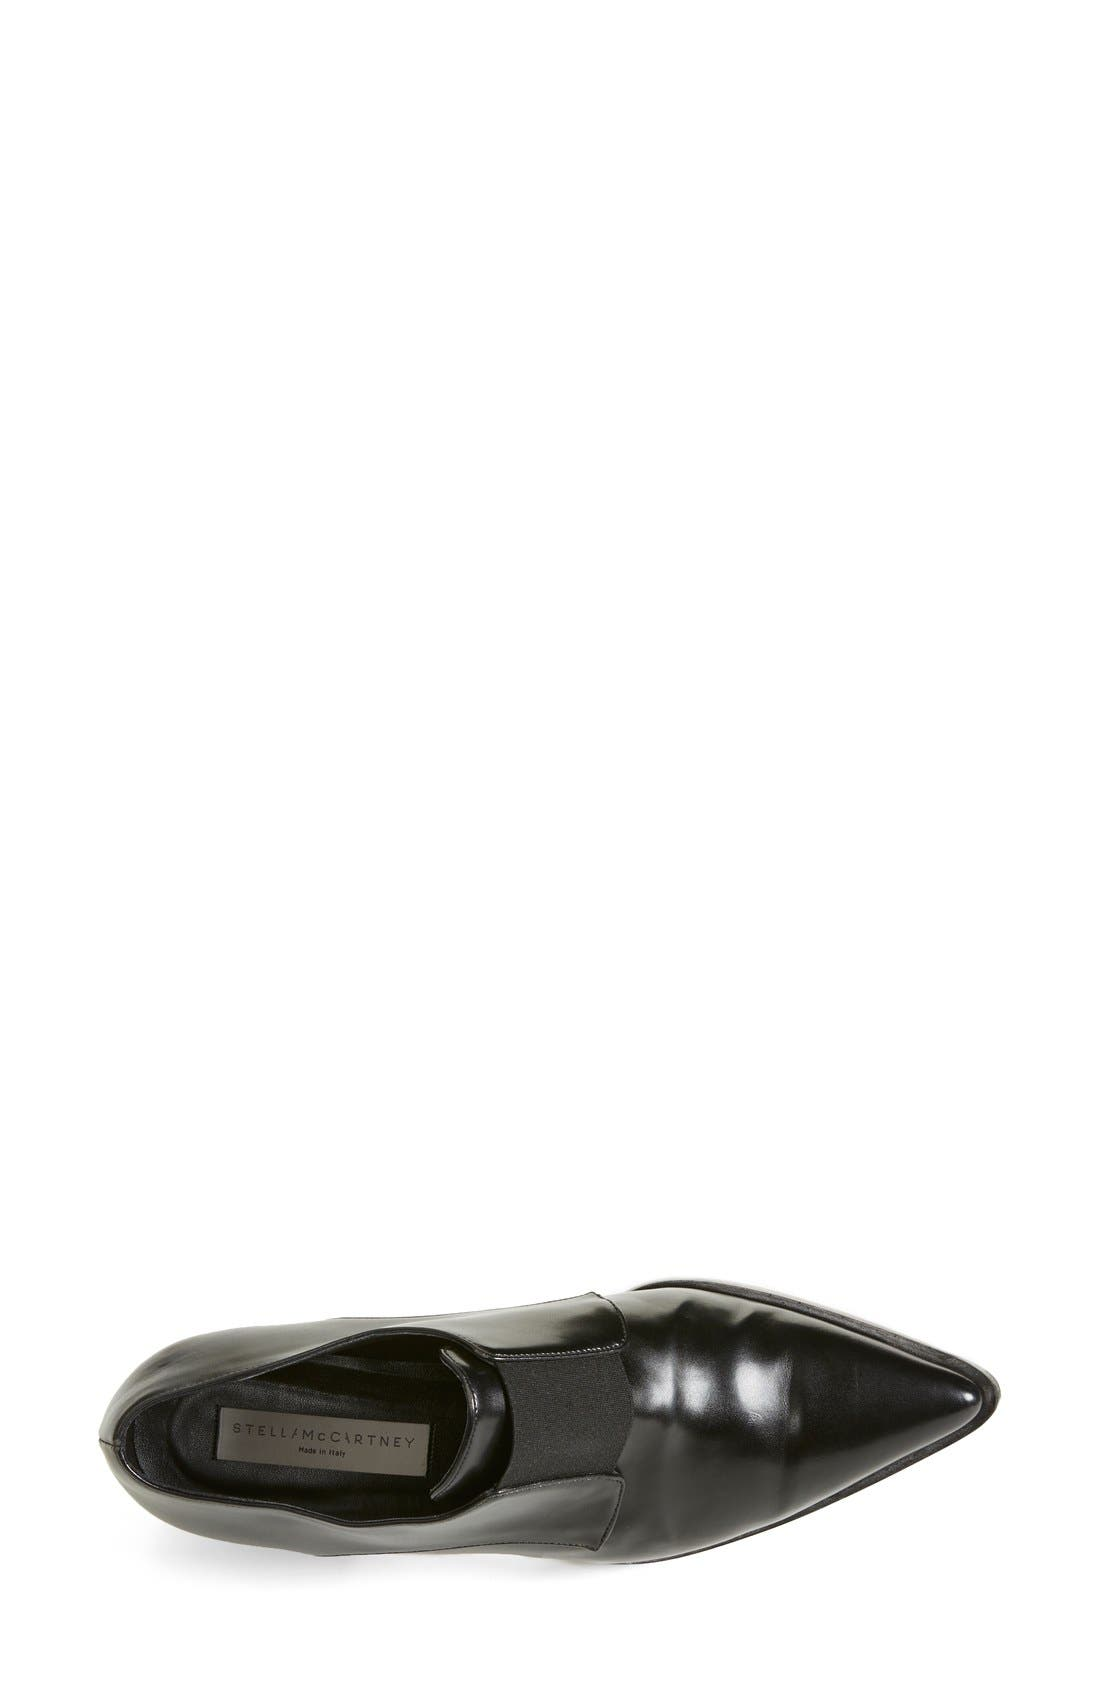 Alternate Image 3  - Stella McCartney Pointy Toe Loafer Flat (Women)